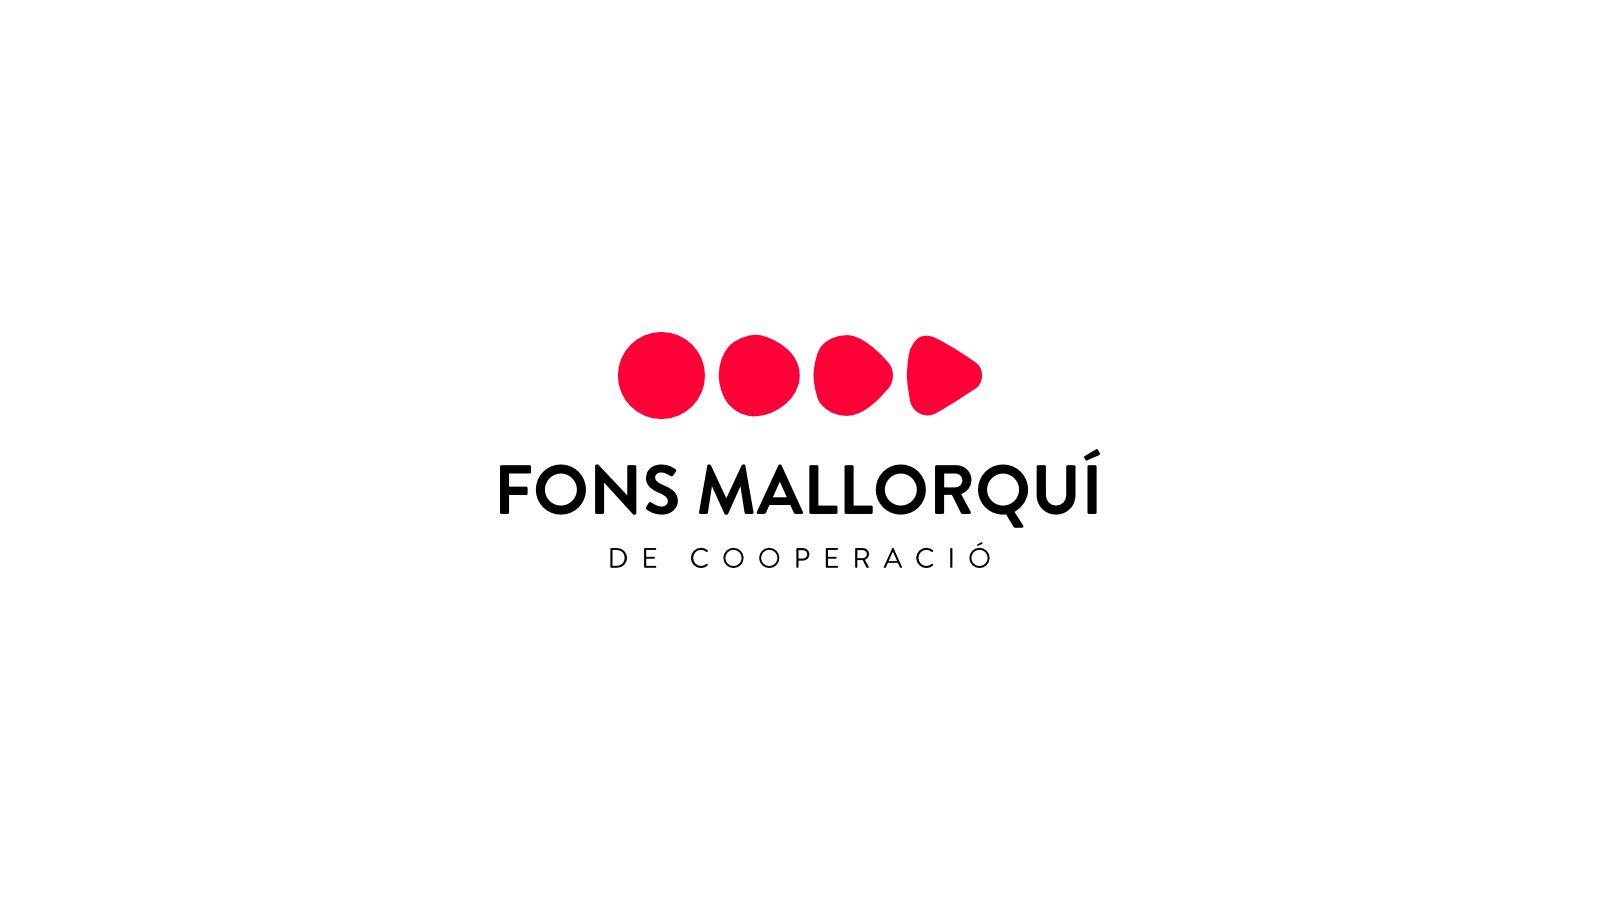 Fons Mallorquí